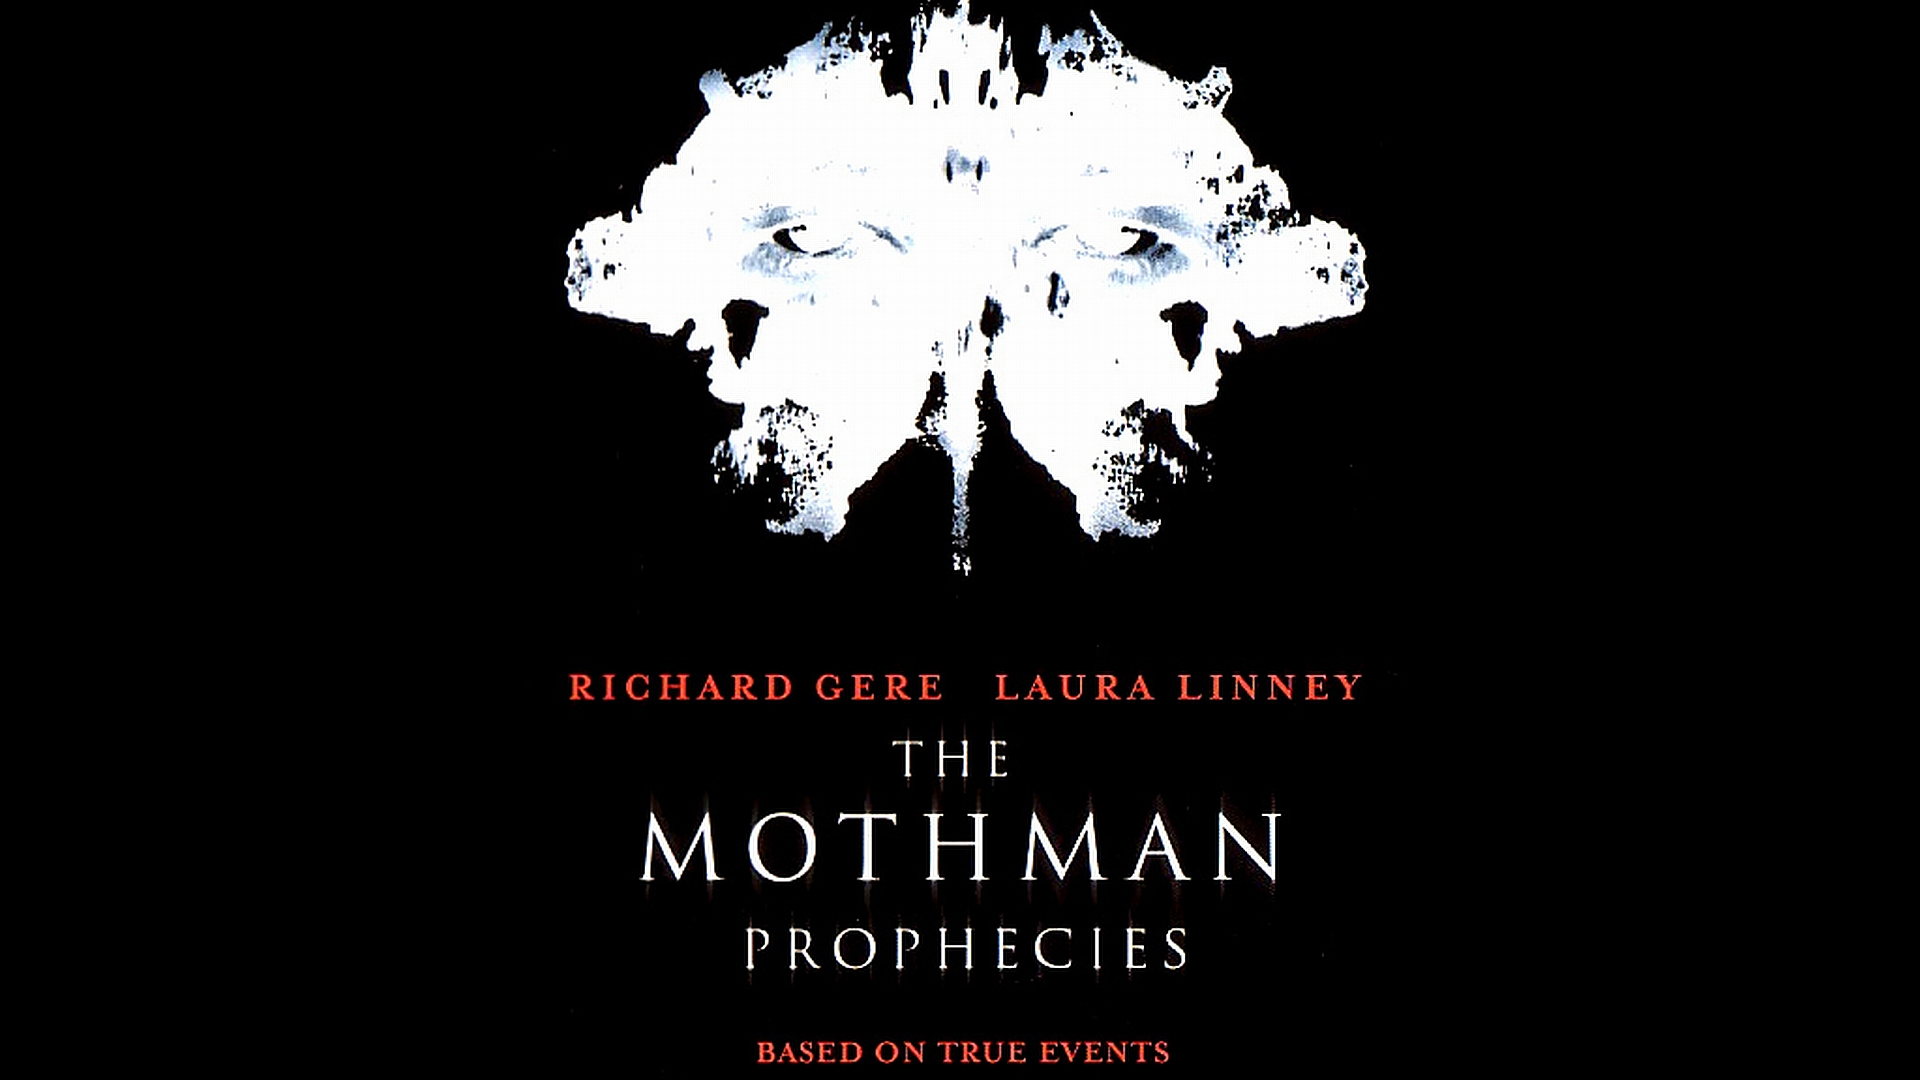 The Mothman Prophecies - Popular Pittsburgh